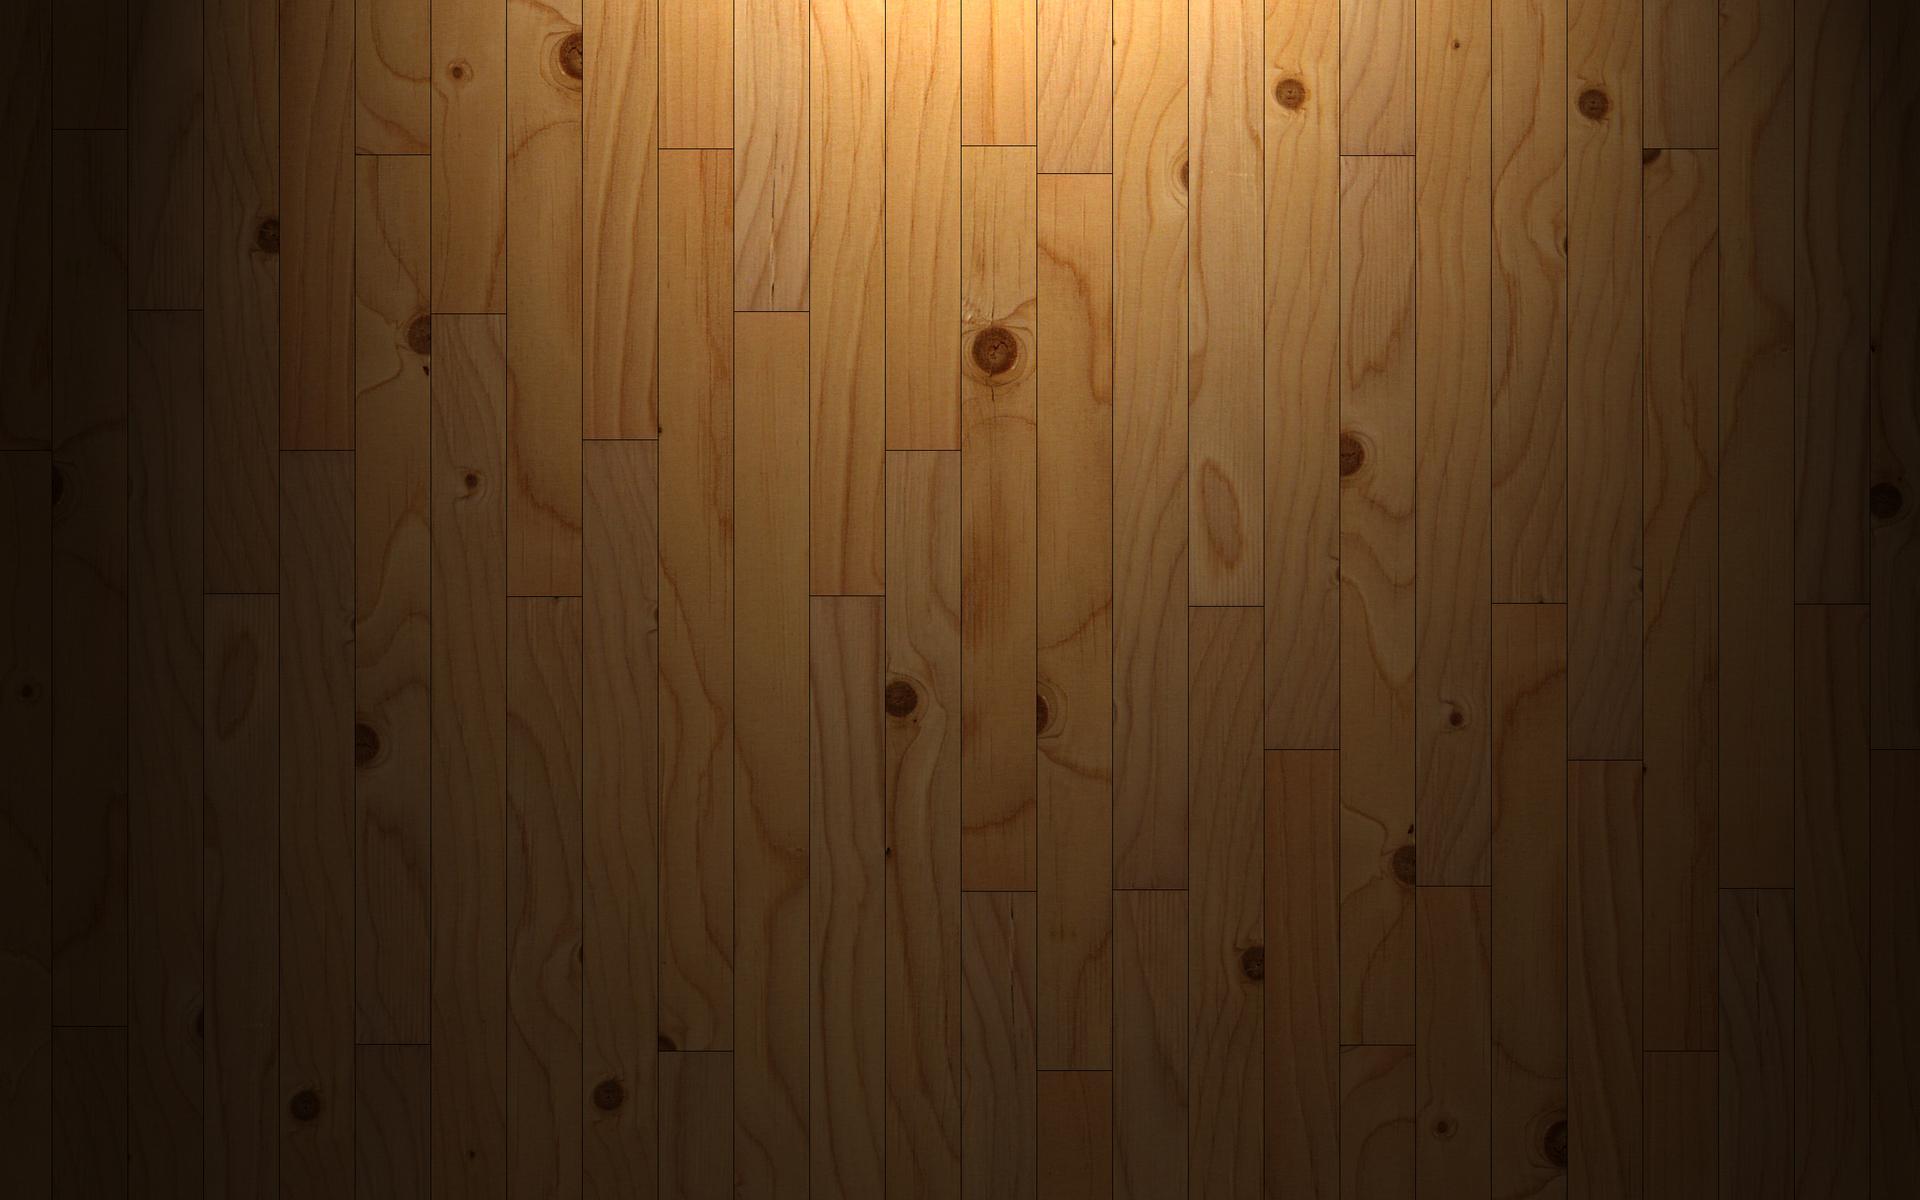 1920x1200px hd wallpaper website - wallpapersafari